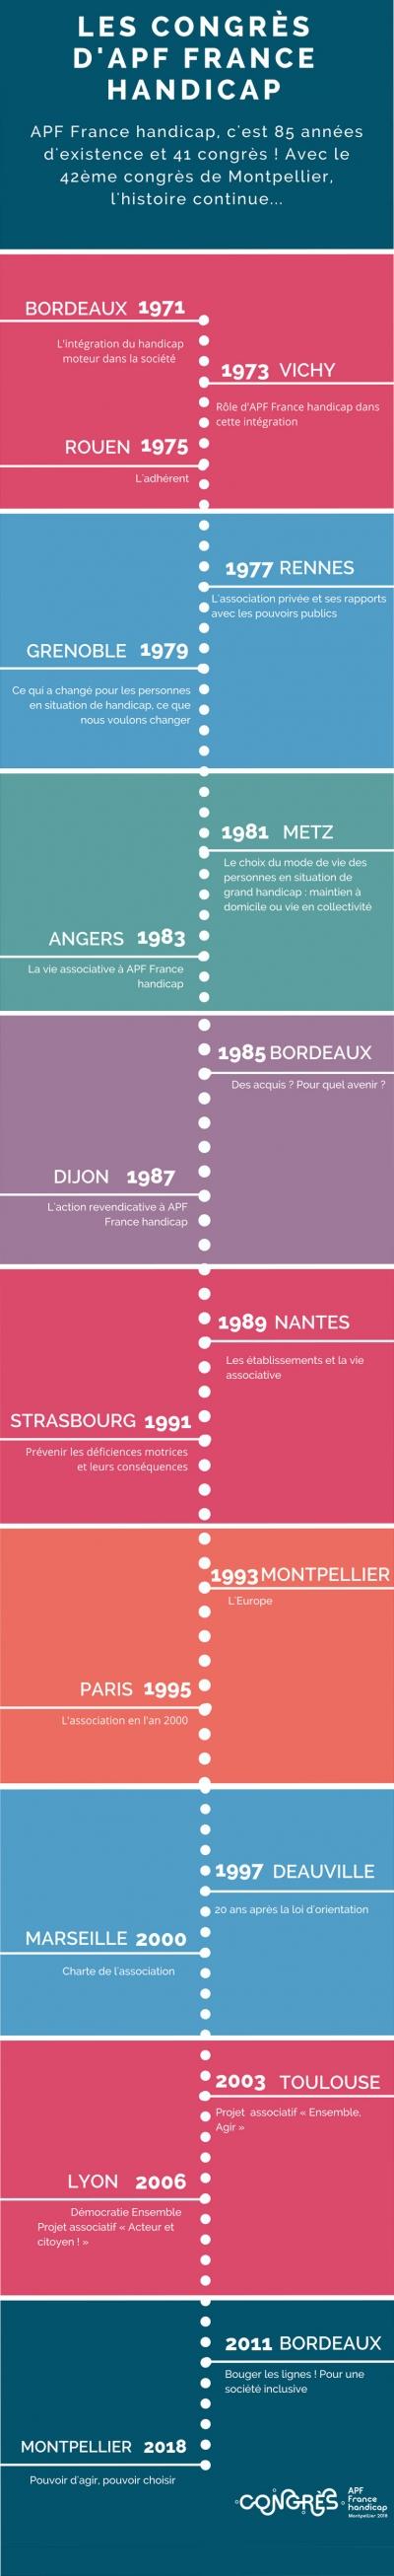 infographie-congrès-v1 copier.jpg